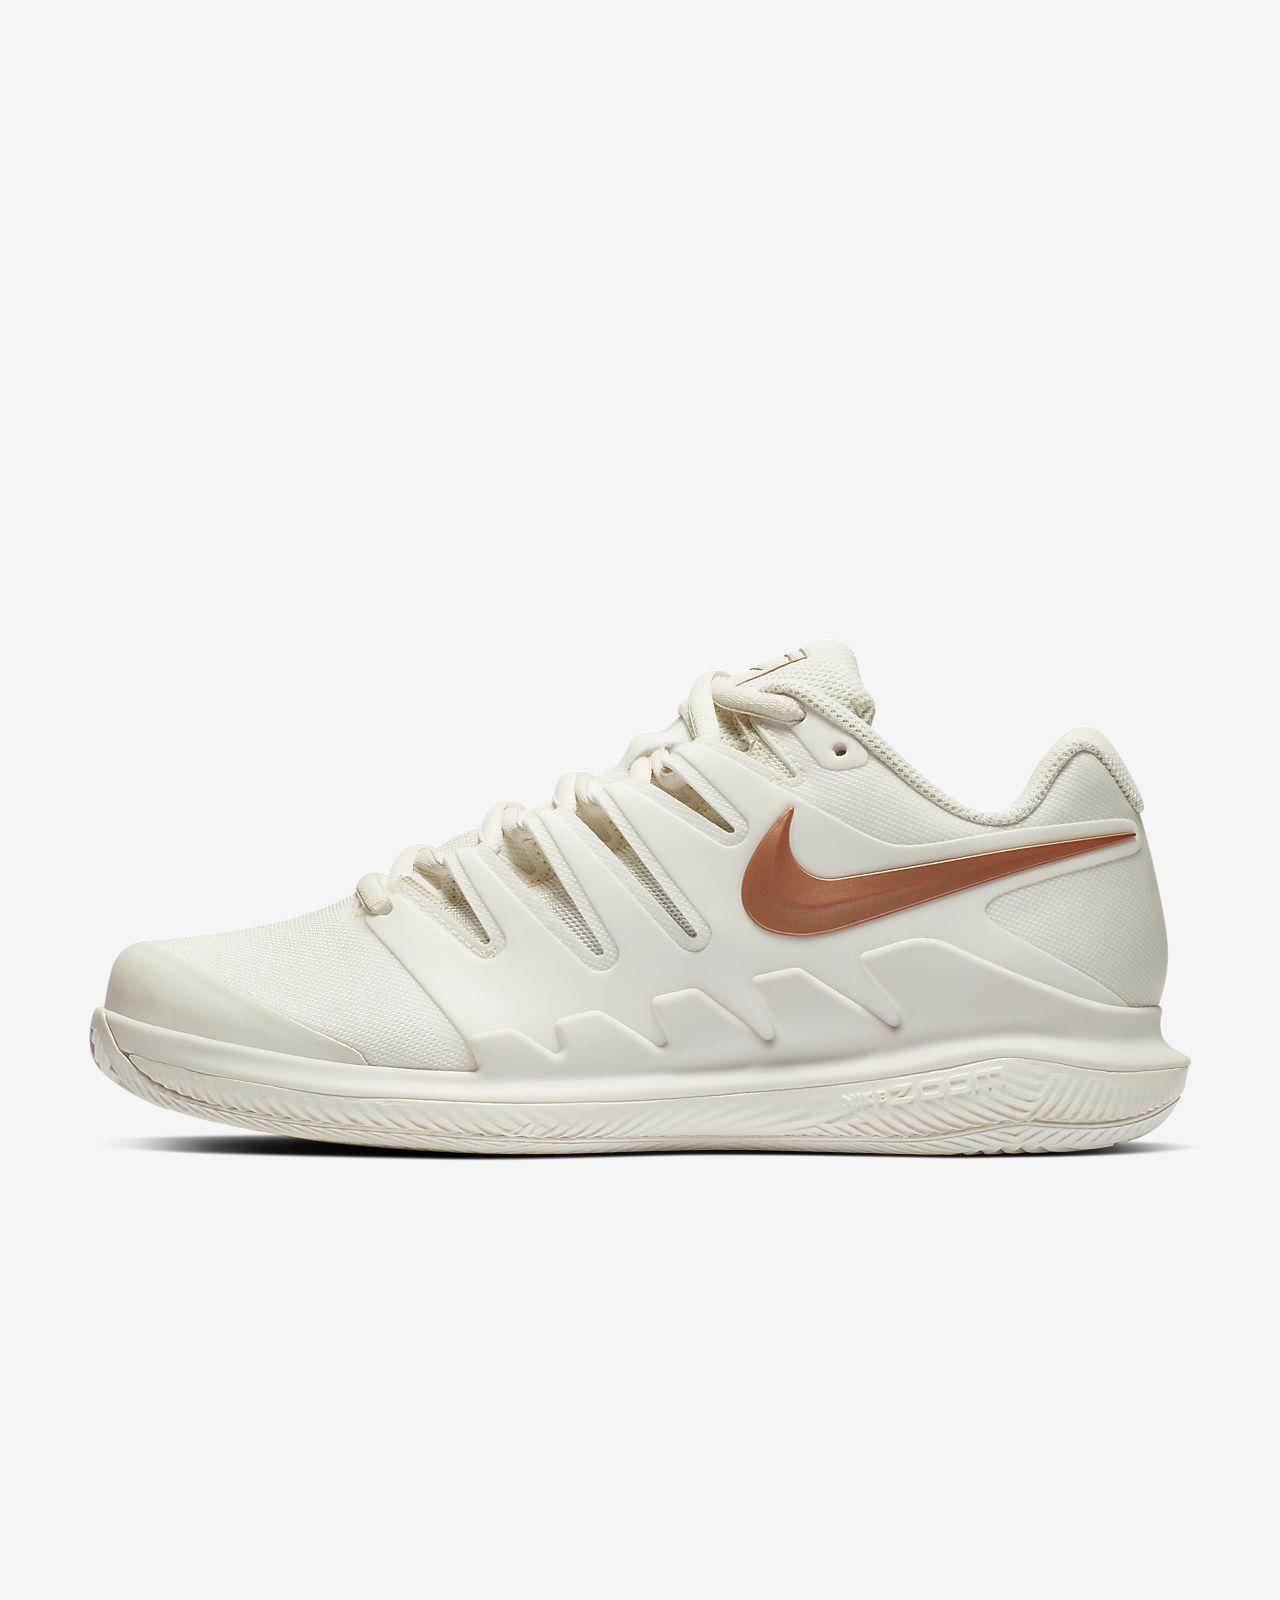 brand new 737b2 a200b Women s Tennis Shoe. Nike Air Zoom Vapor X Clay